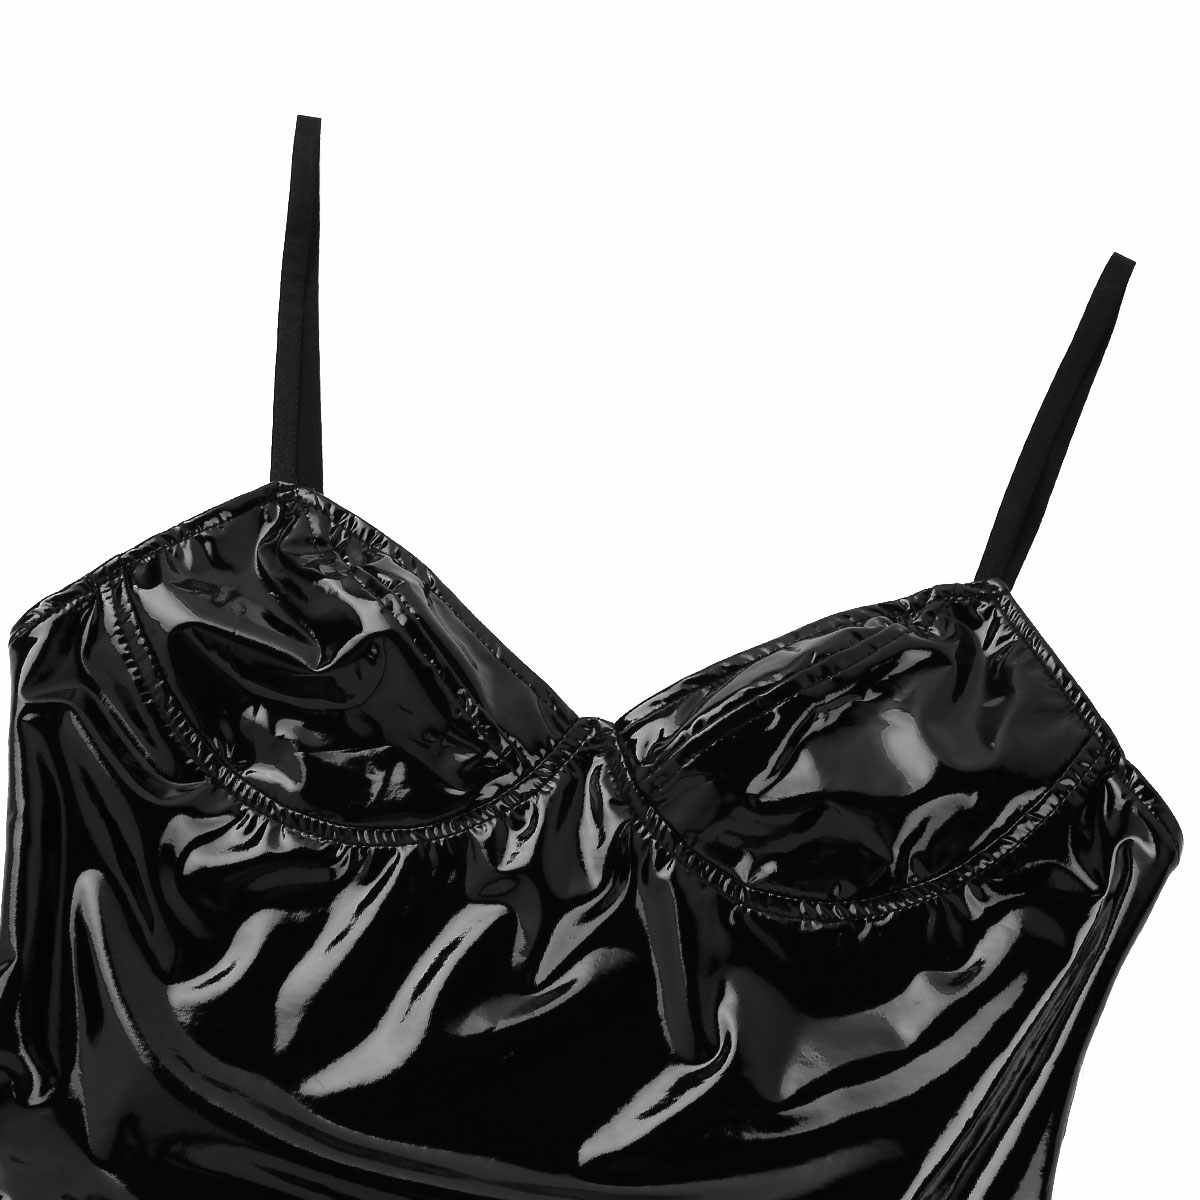 Vrouwen Wet Look Punk Gothic Latex Catsuit Body Sexy Lingerie Bodysuit Lakleer Latex Hoge Cut Erotische Rave Outfits Clubwear